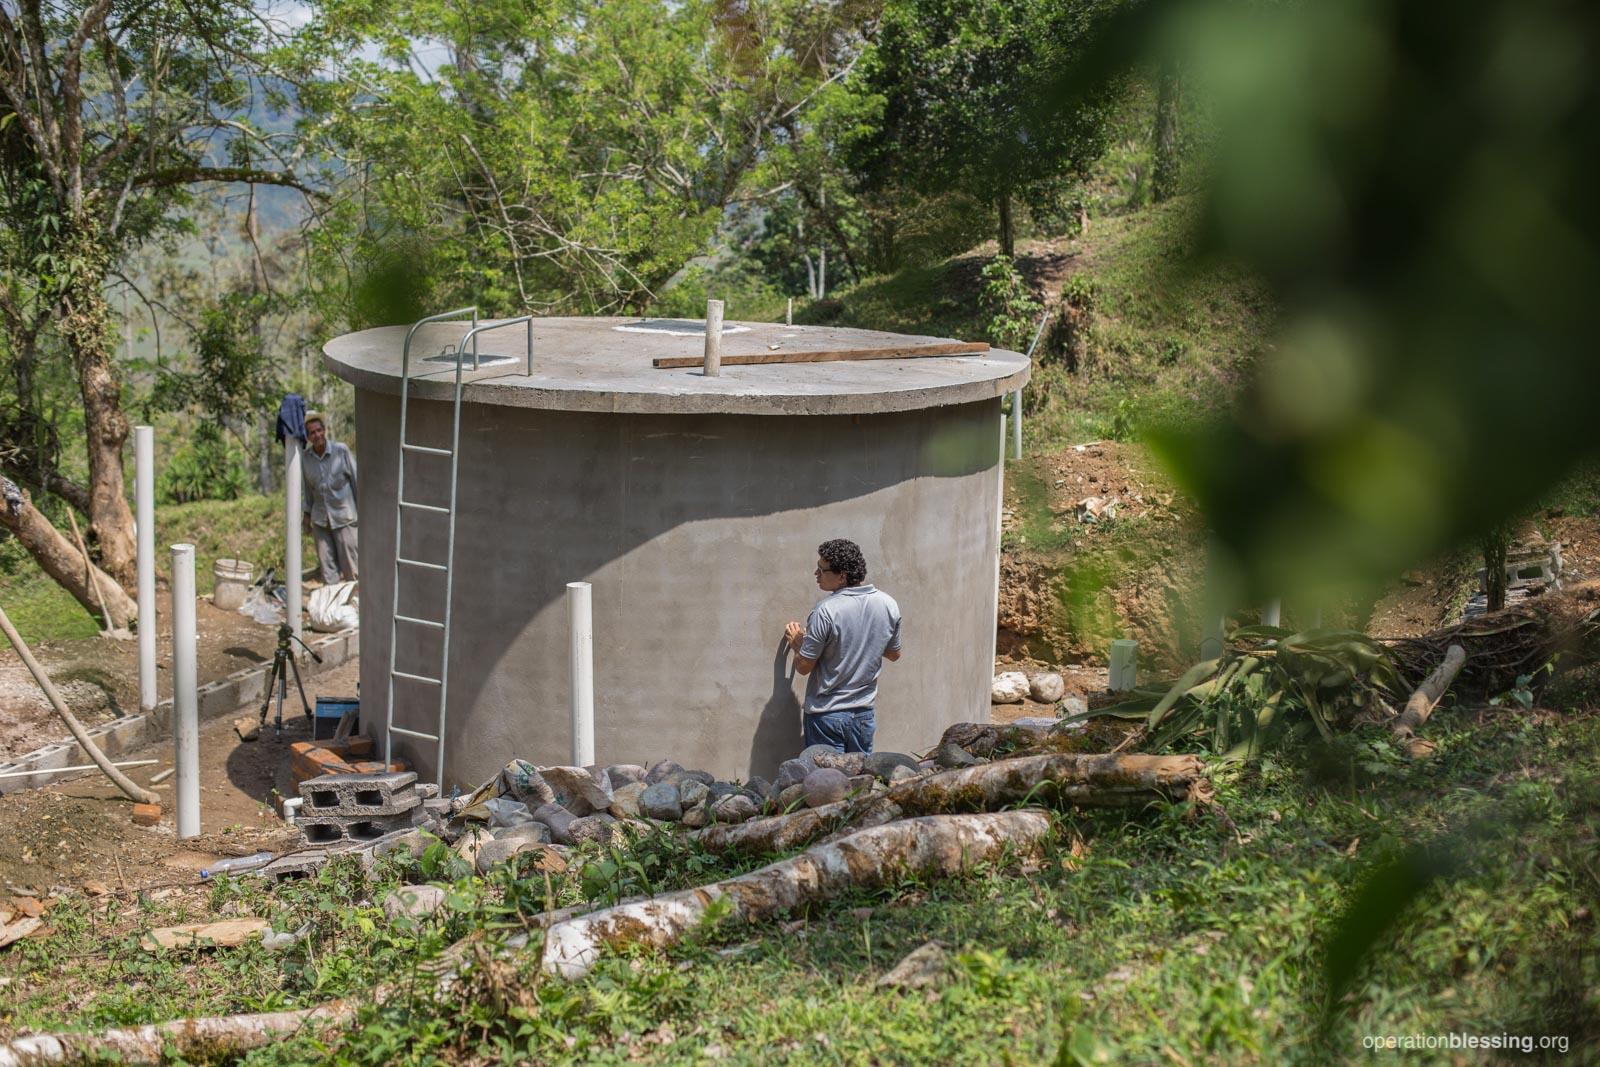 A new safe water tank in San Rafael.